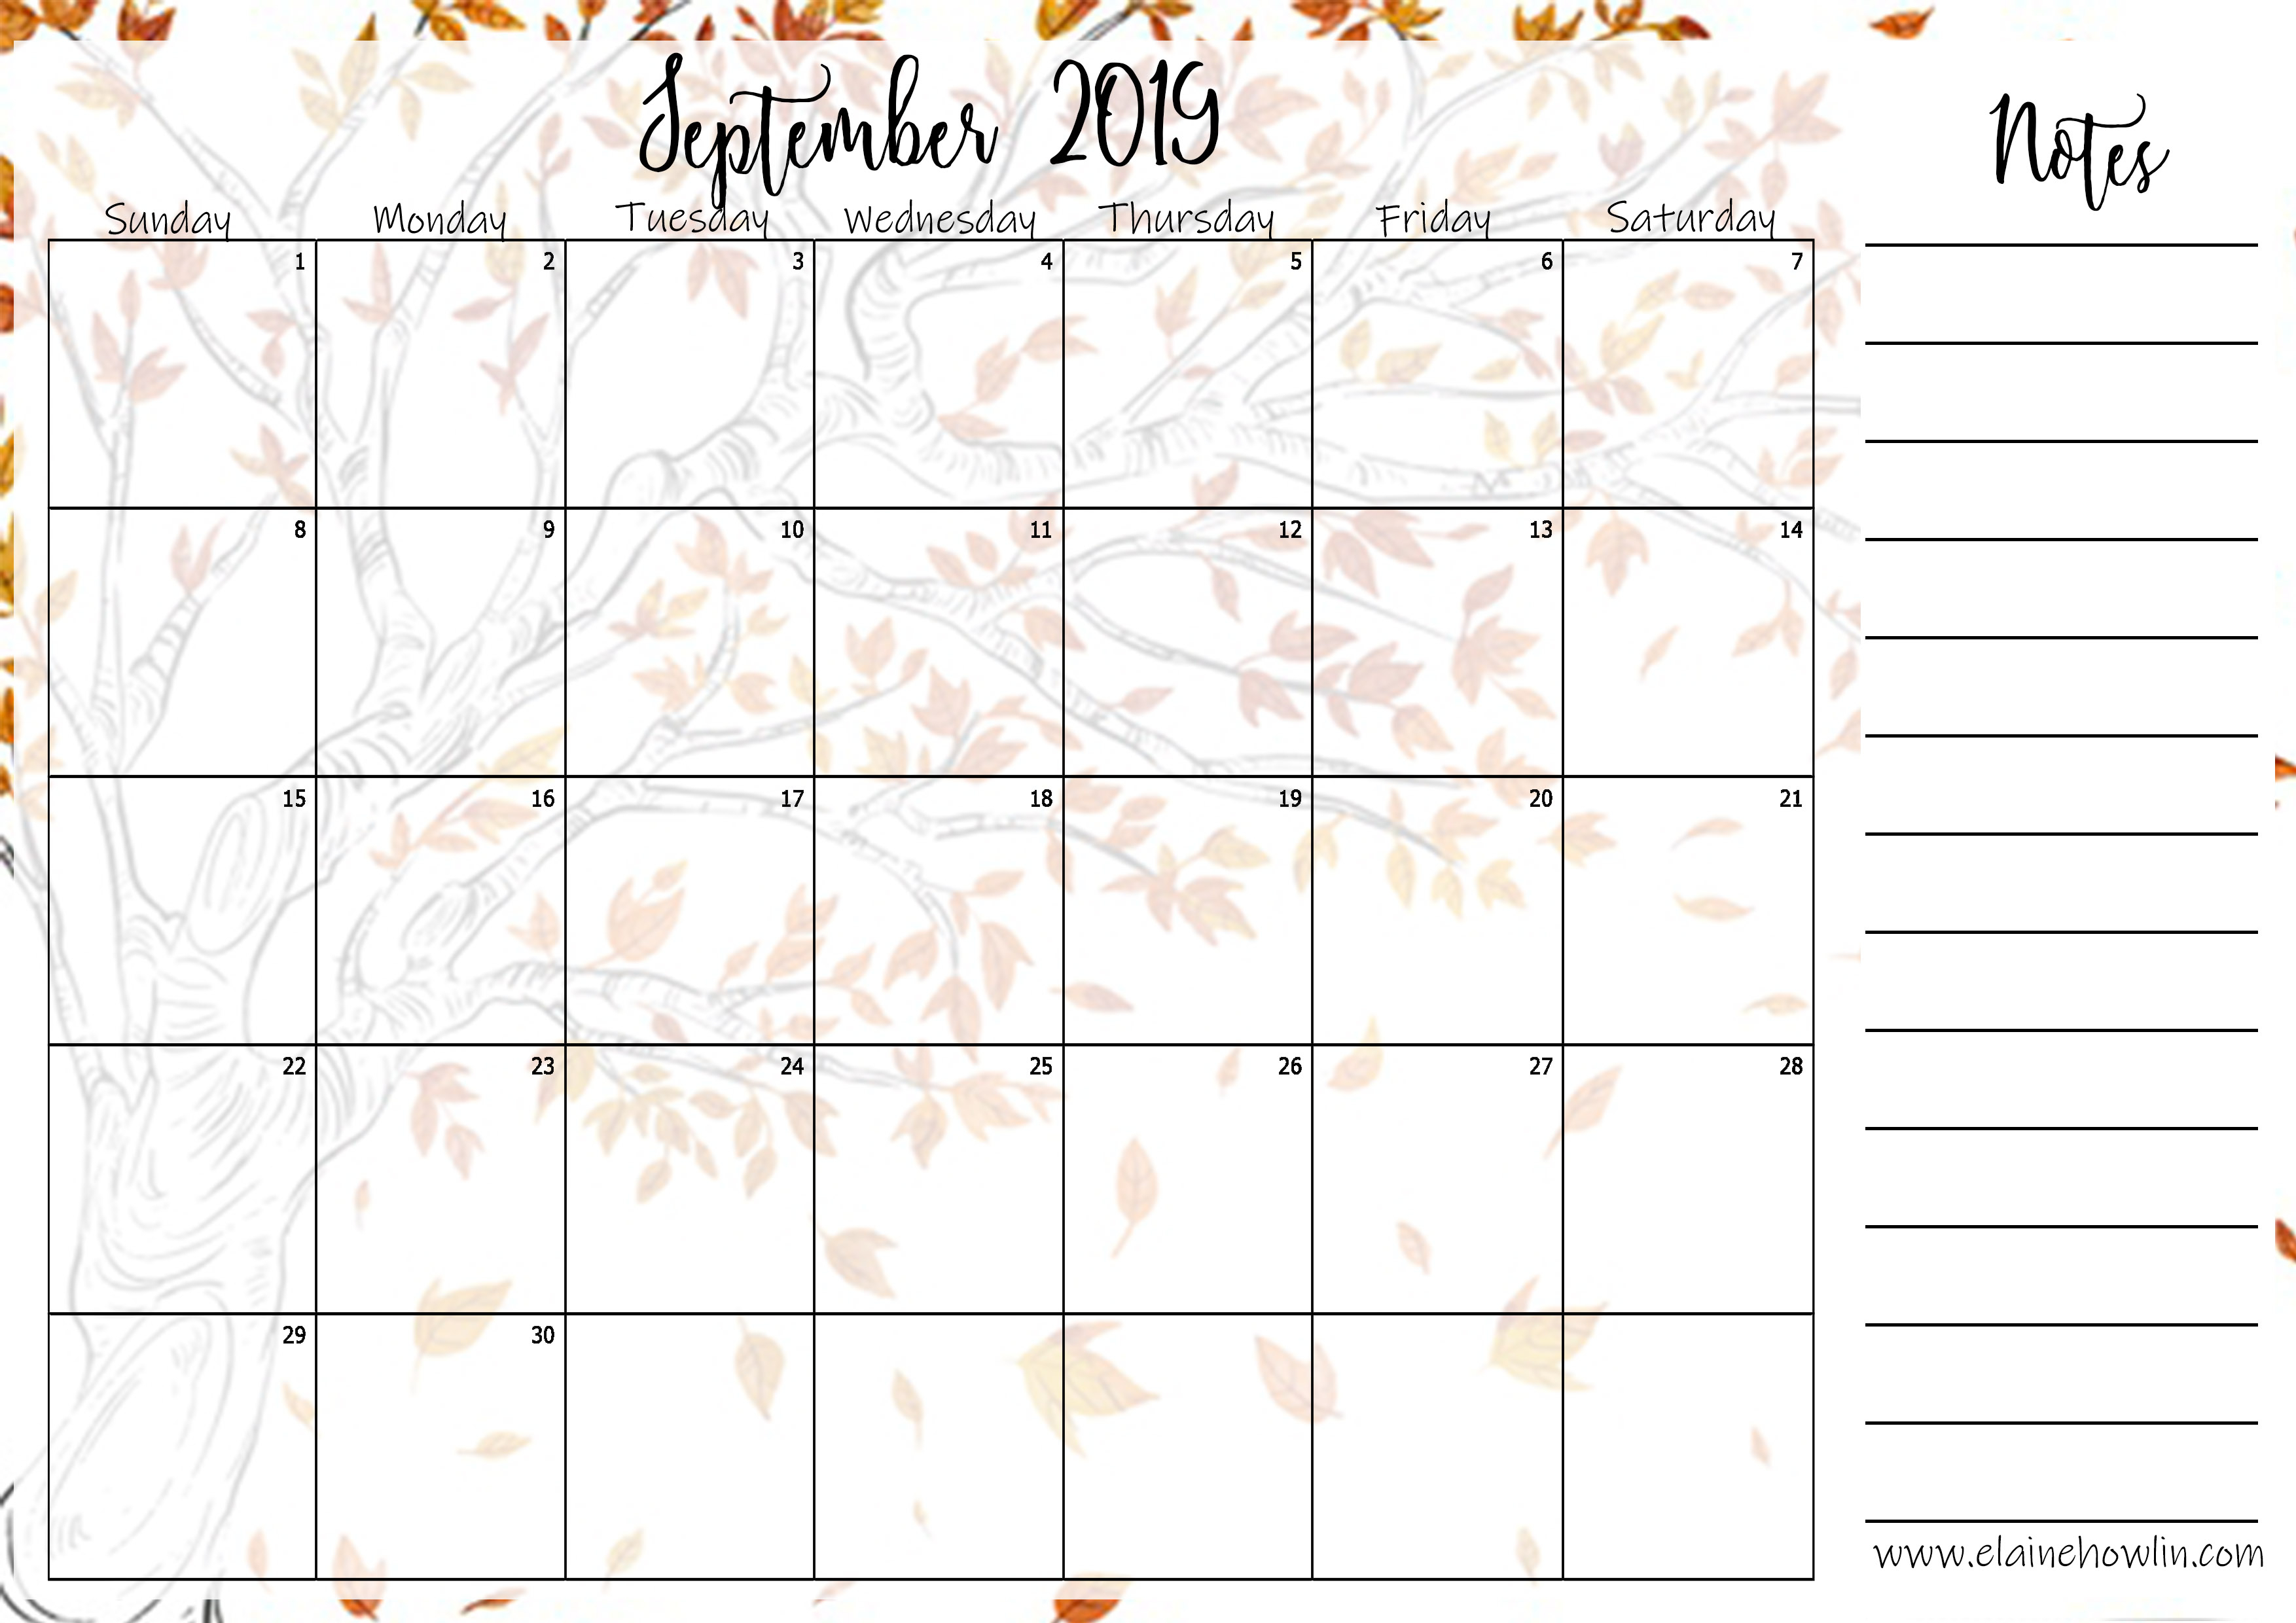 September Content Planner Calendar Template – Elaine Howlin with regard to Emoji Blitz Calendar 2020